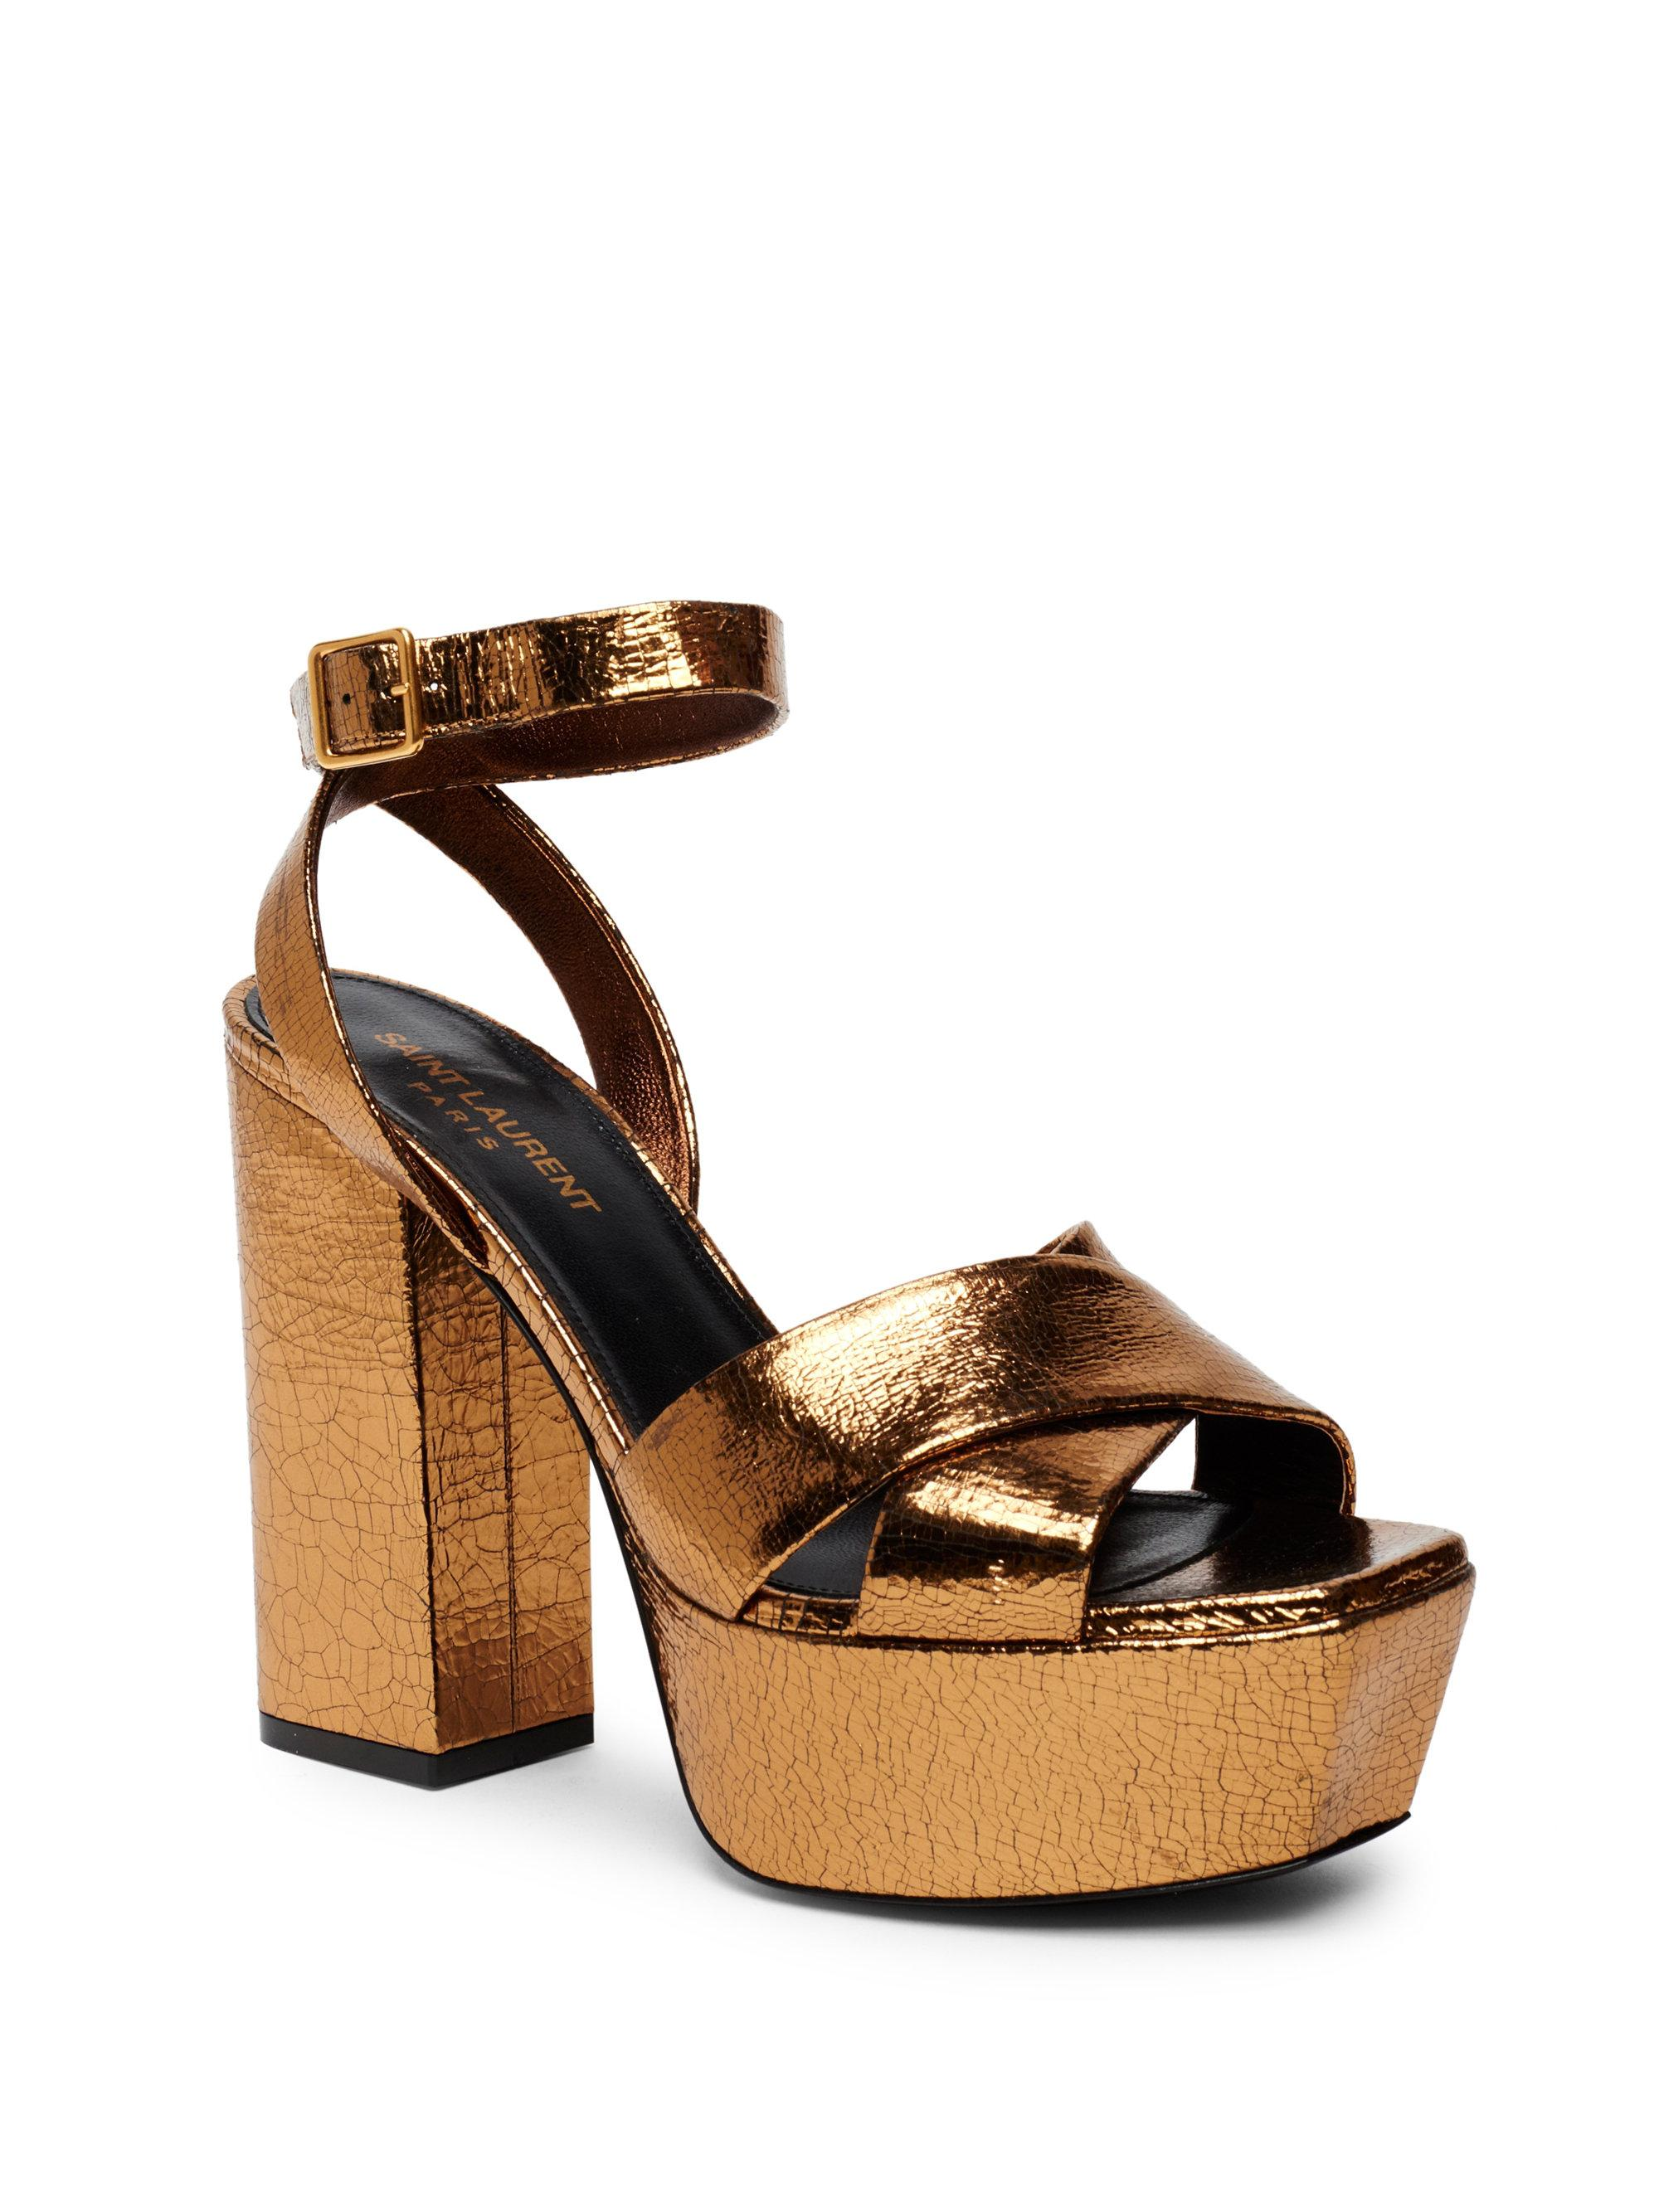 af1a694e9b2f Saks Saint Laurent Mens Shoes